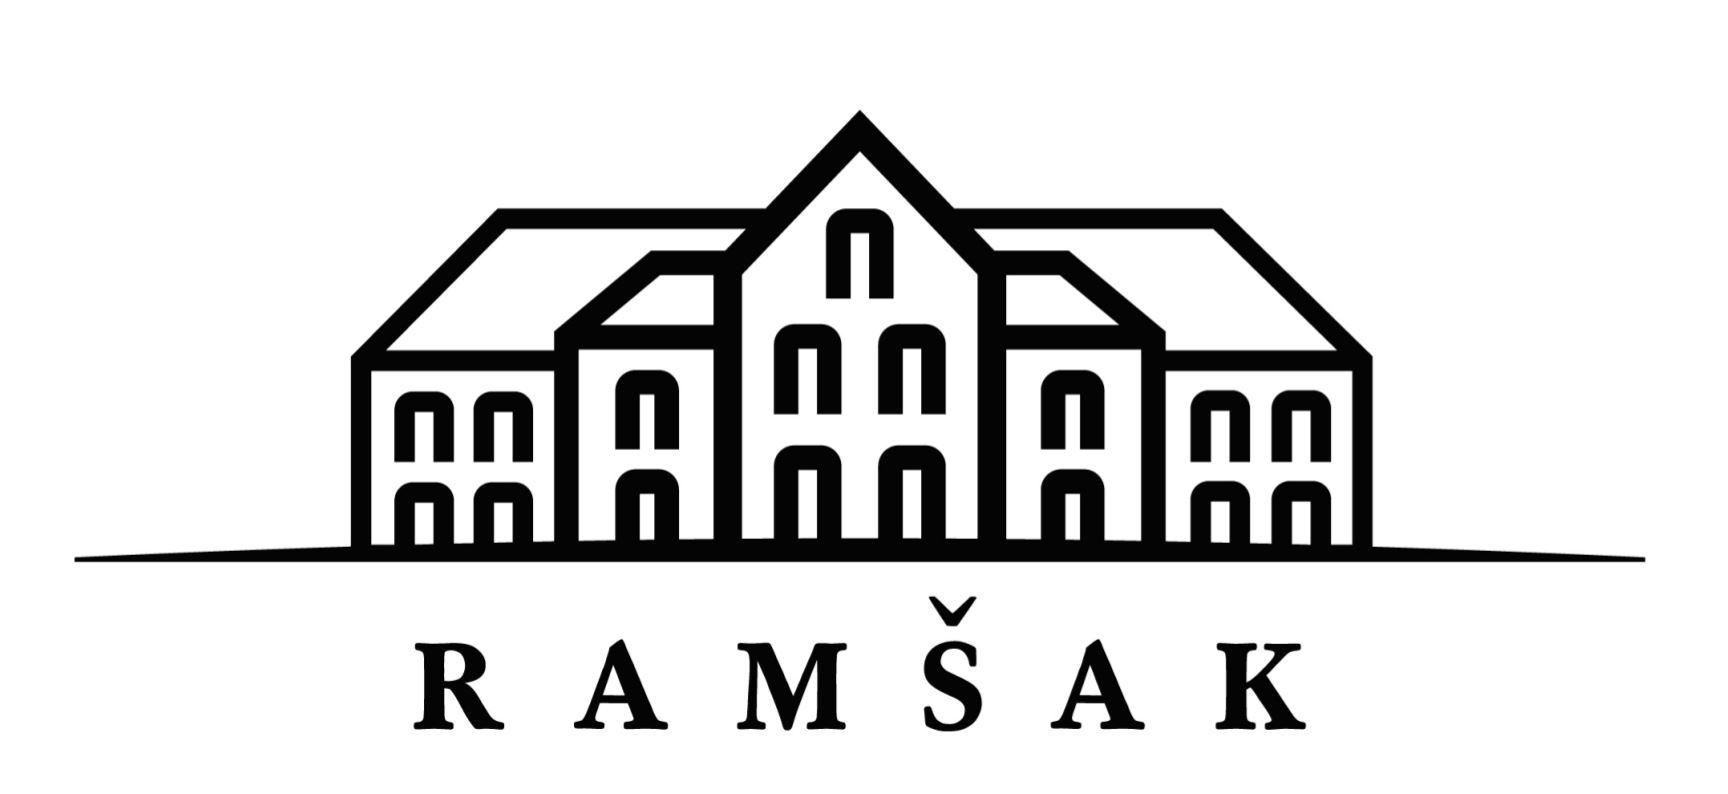 Ramsak Vinogradnistvo Winery Ramsak